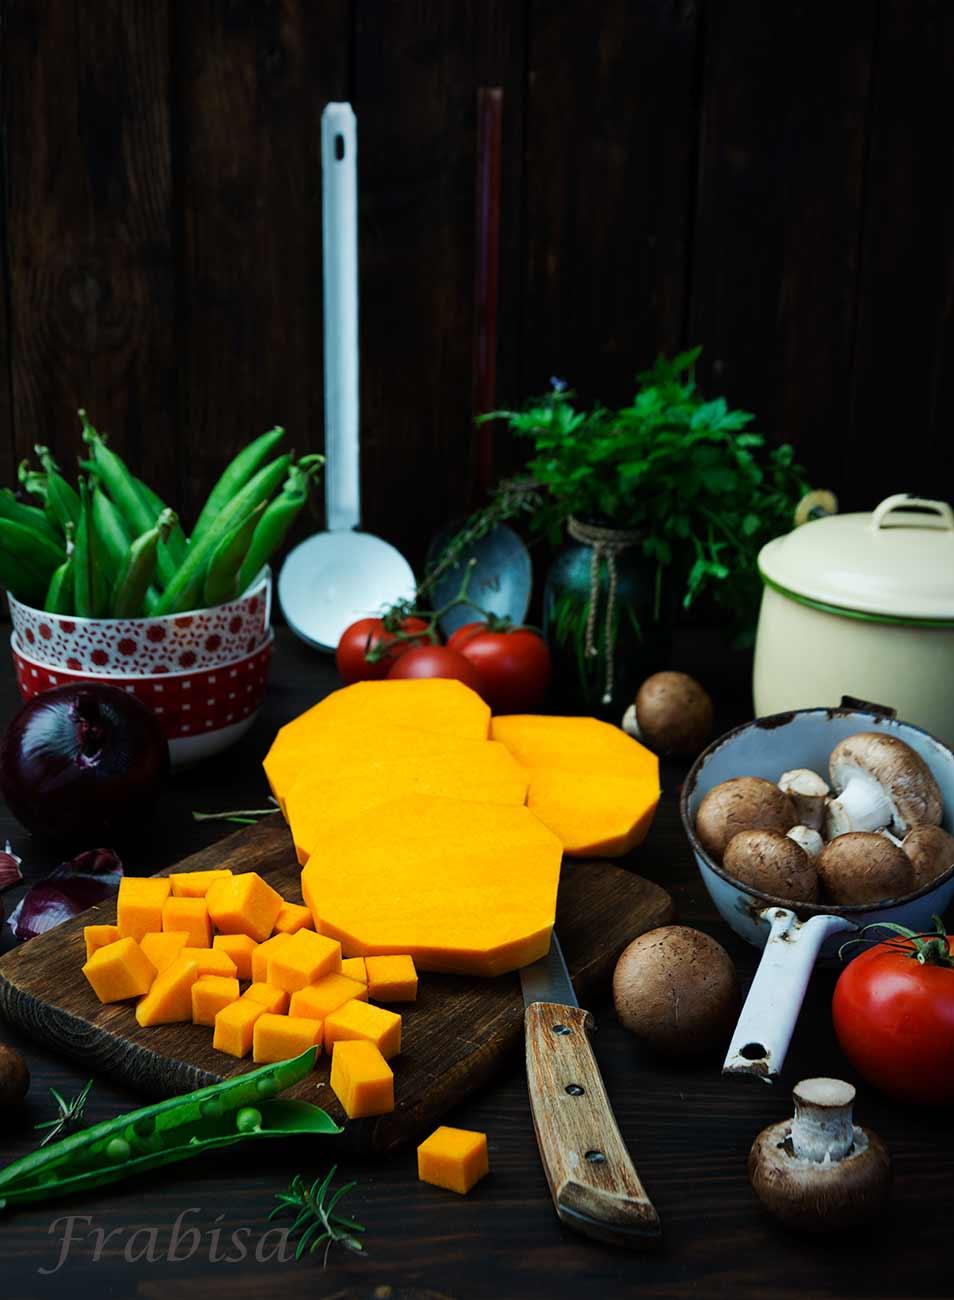 risotto-de-iberico-calabaza, arroz, jamon, guiso